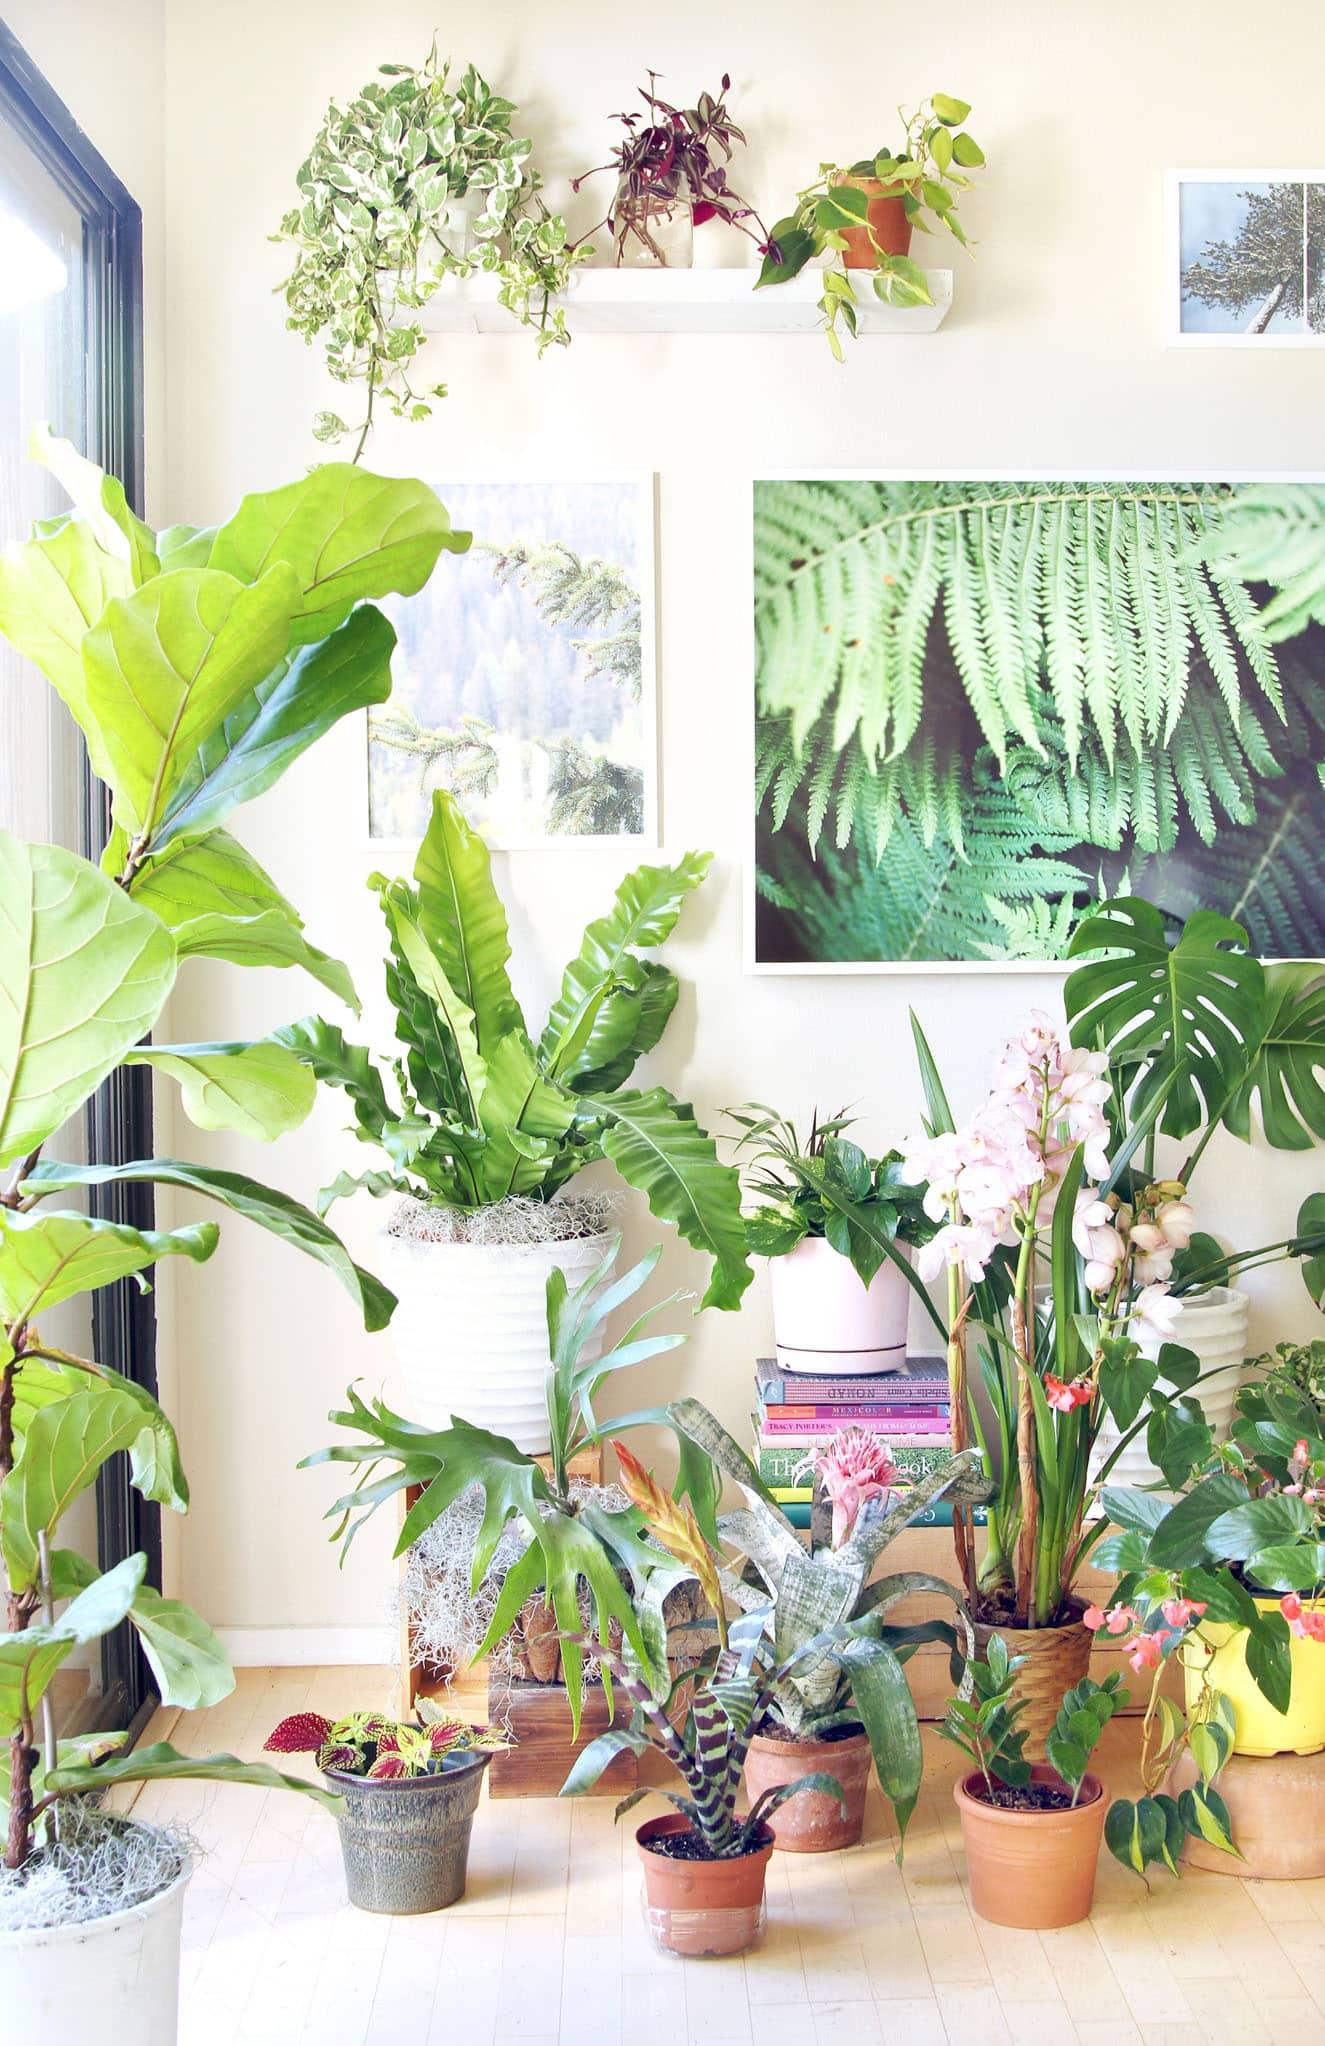 best-indoor-plants-flowering-house-plants-easy-to-grow-houseplants-apieceofrainbow-5.jpg